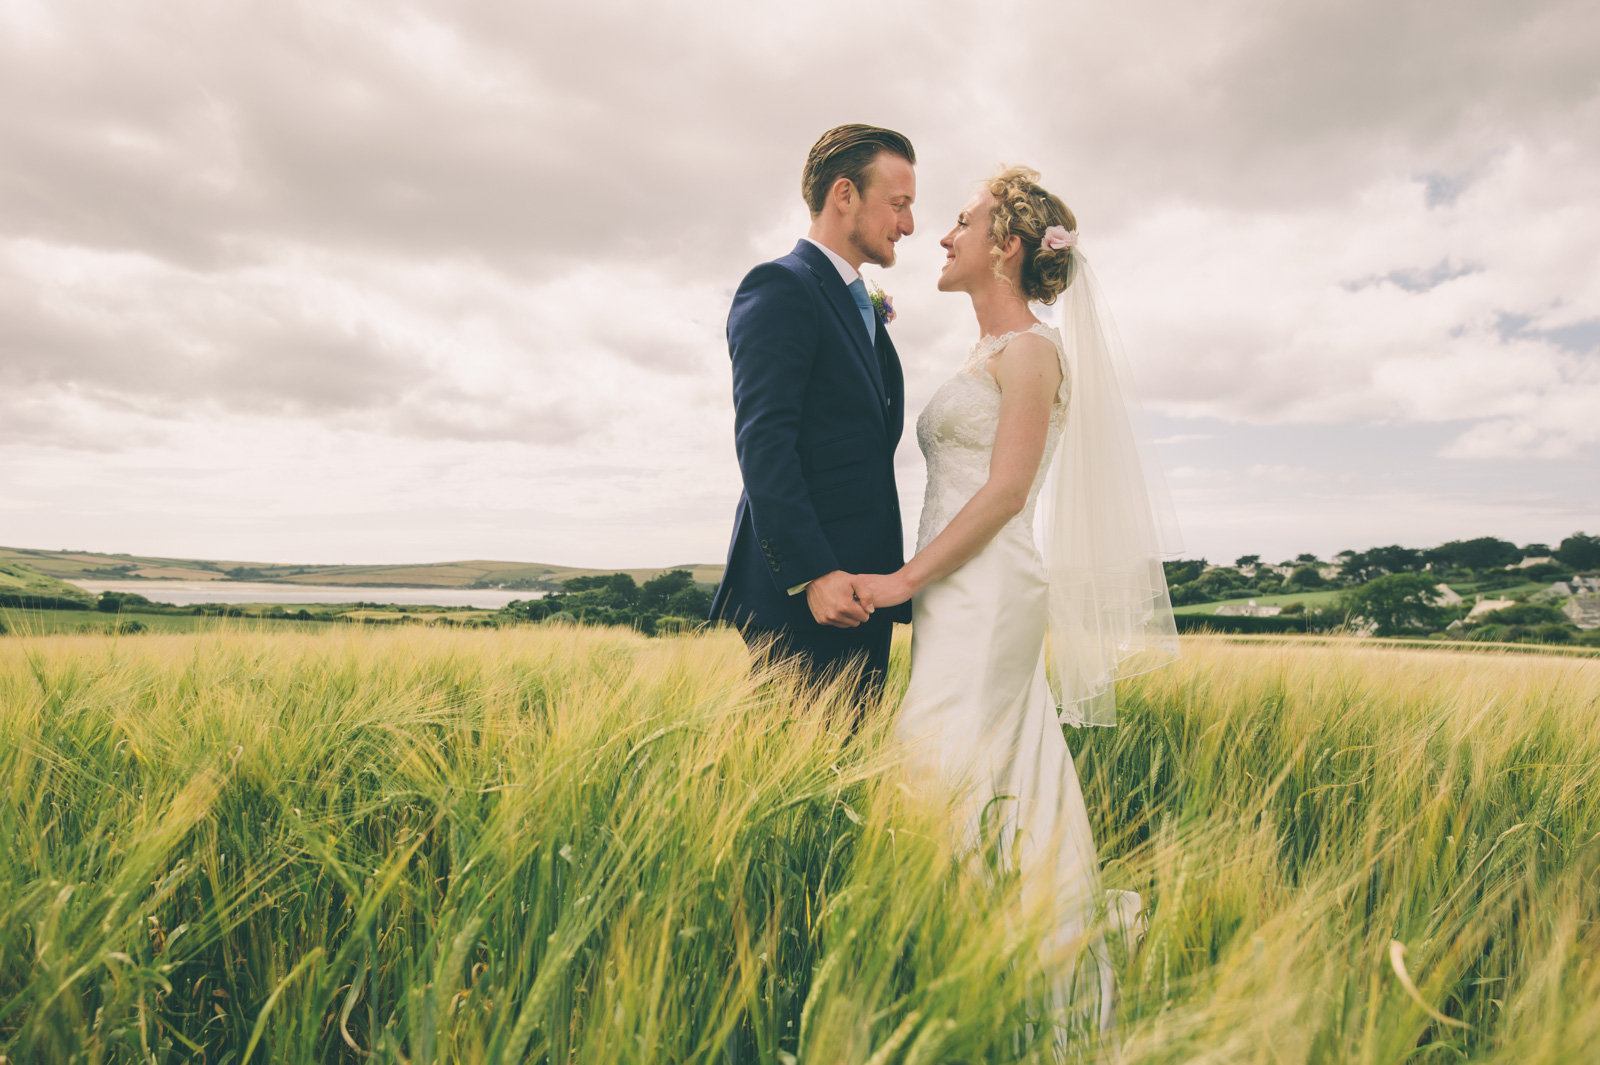 wedding-photography-rock-101.jpg